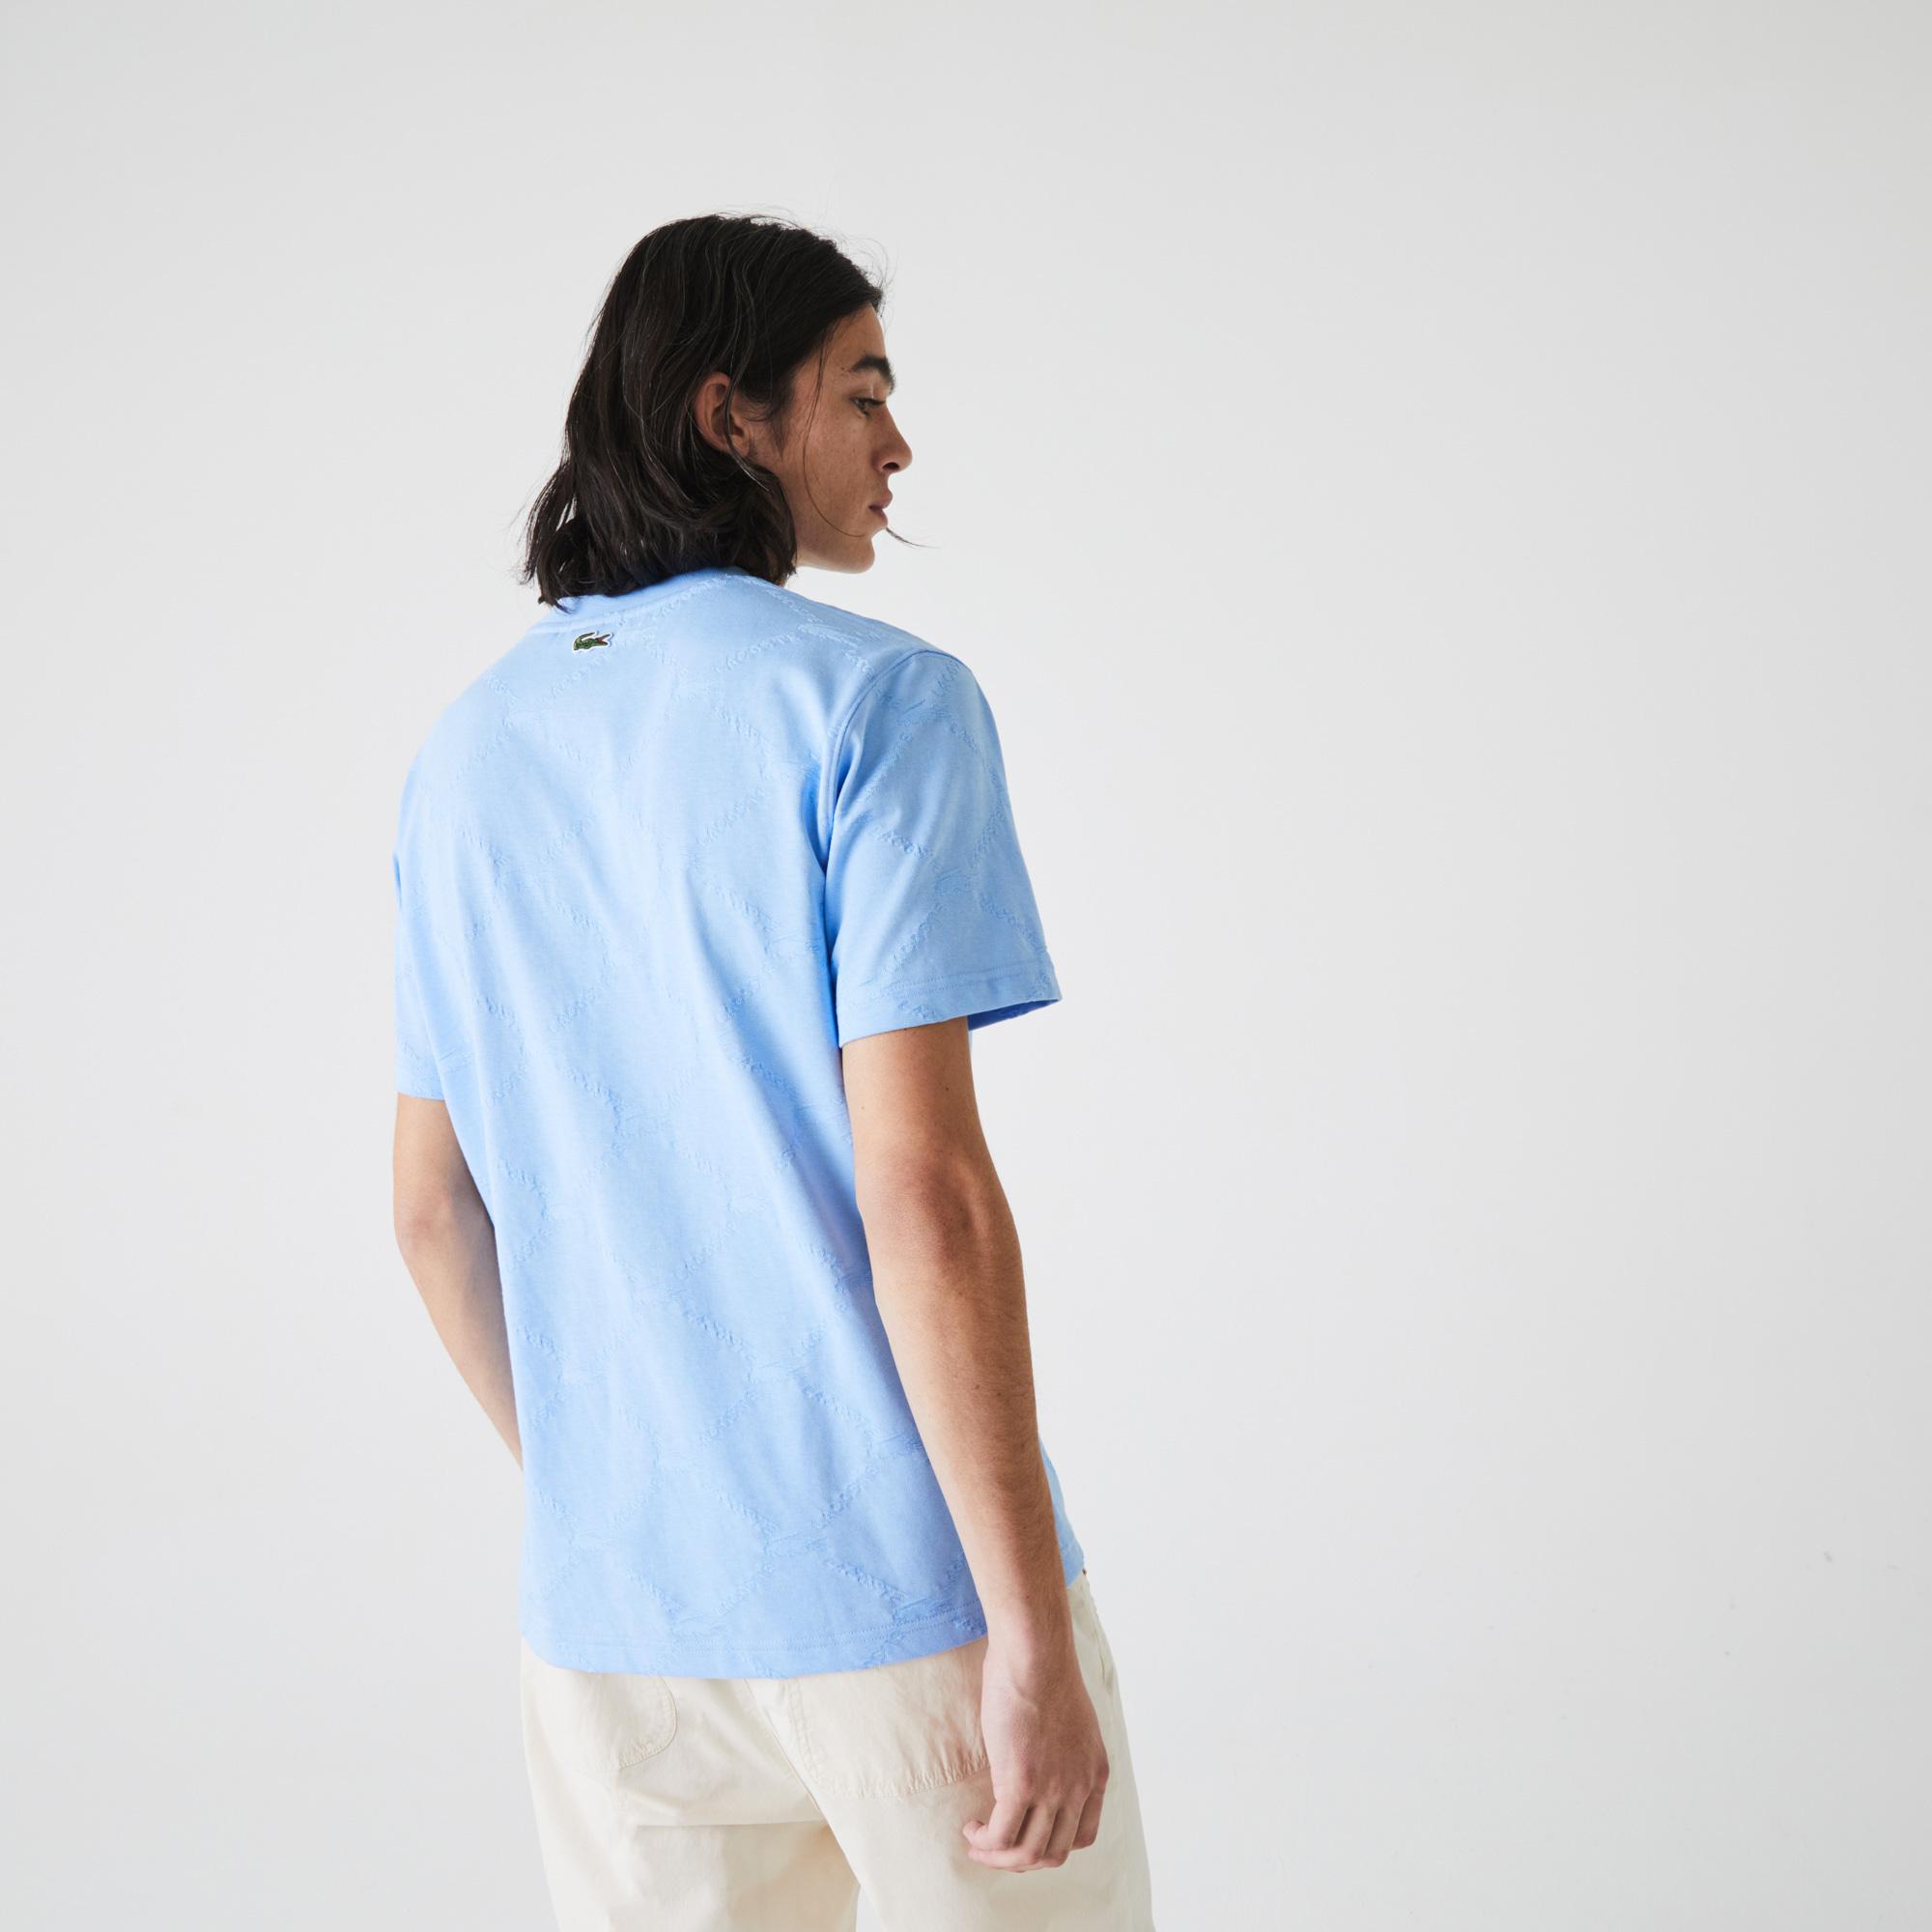 Lacoste футболка чоловіча LIVE